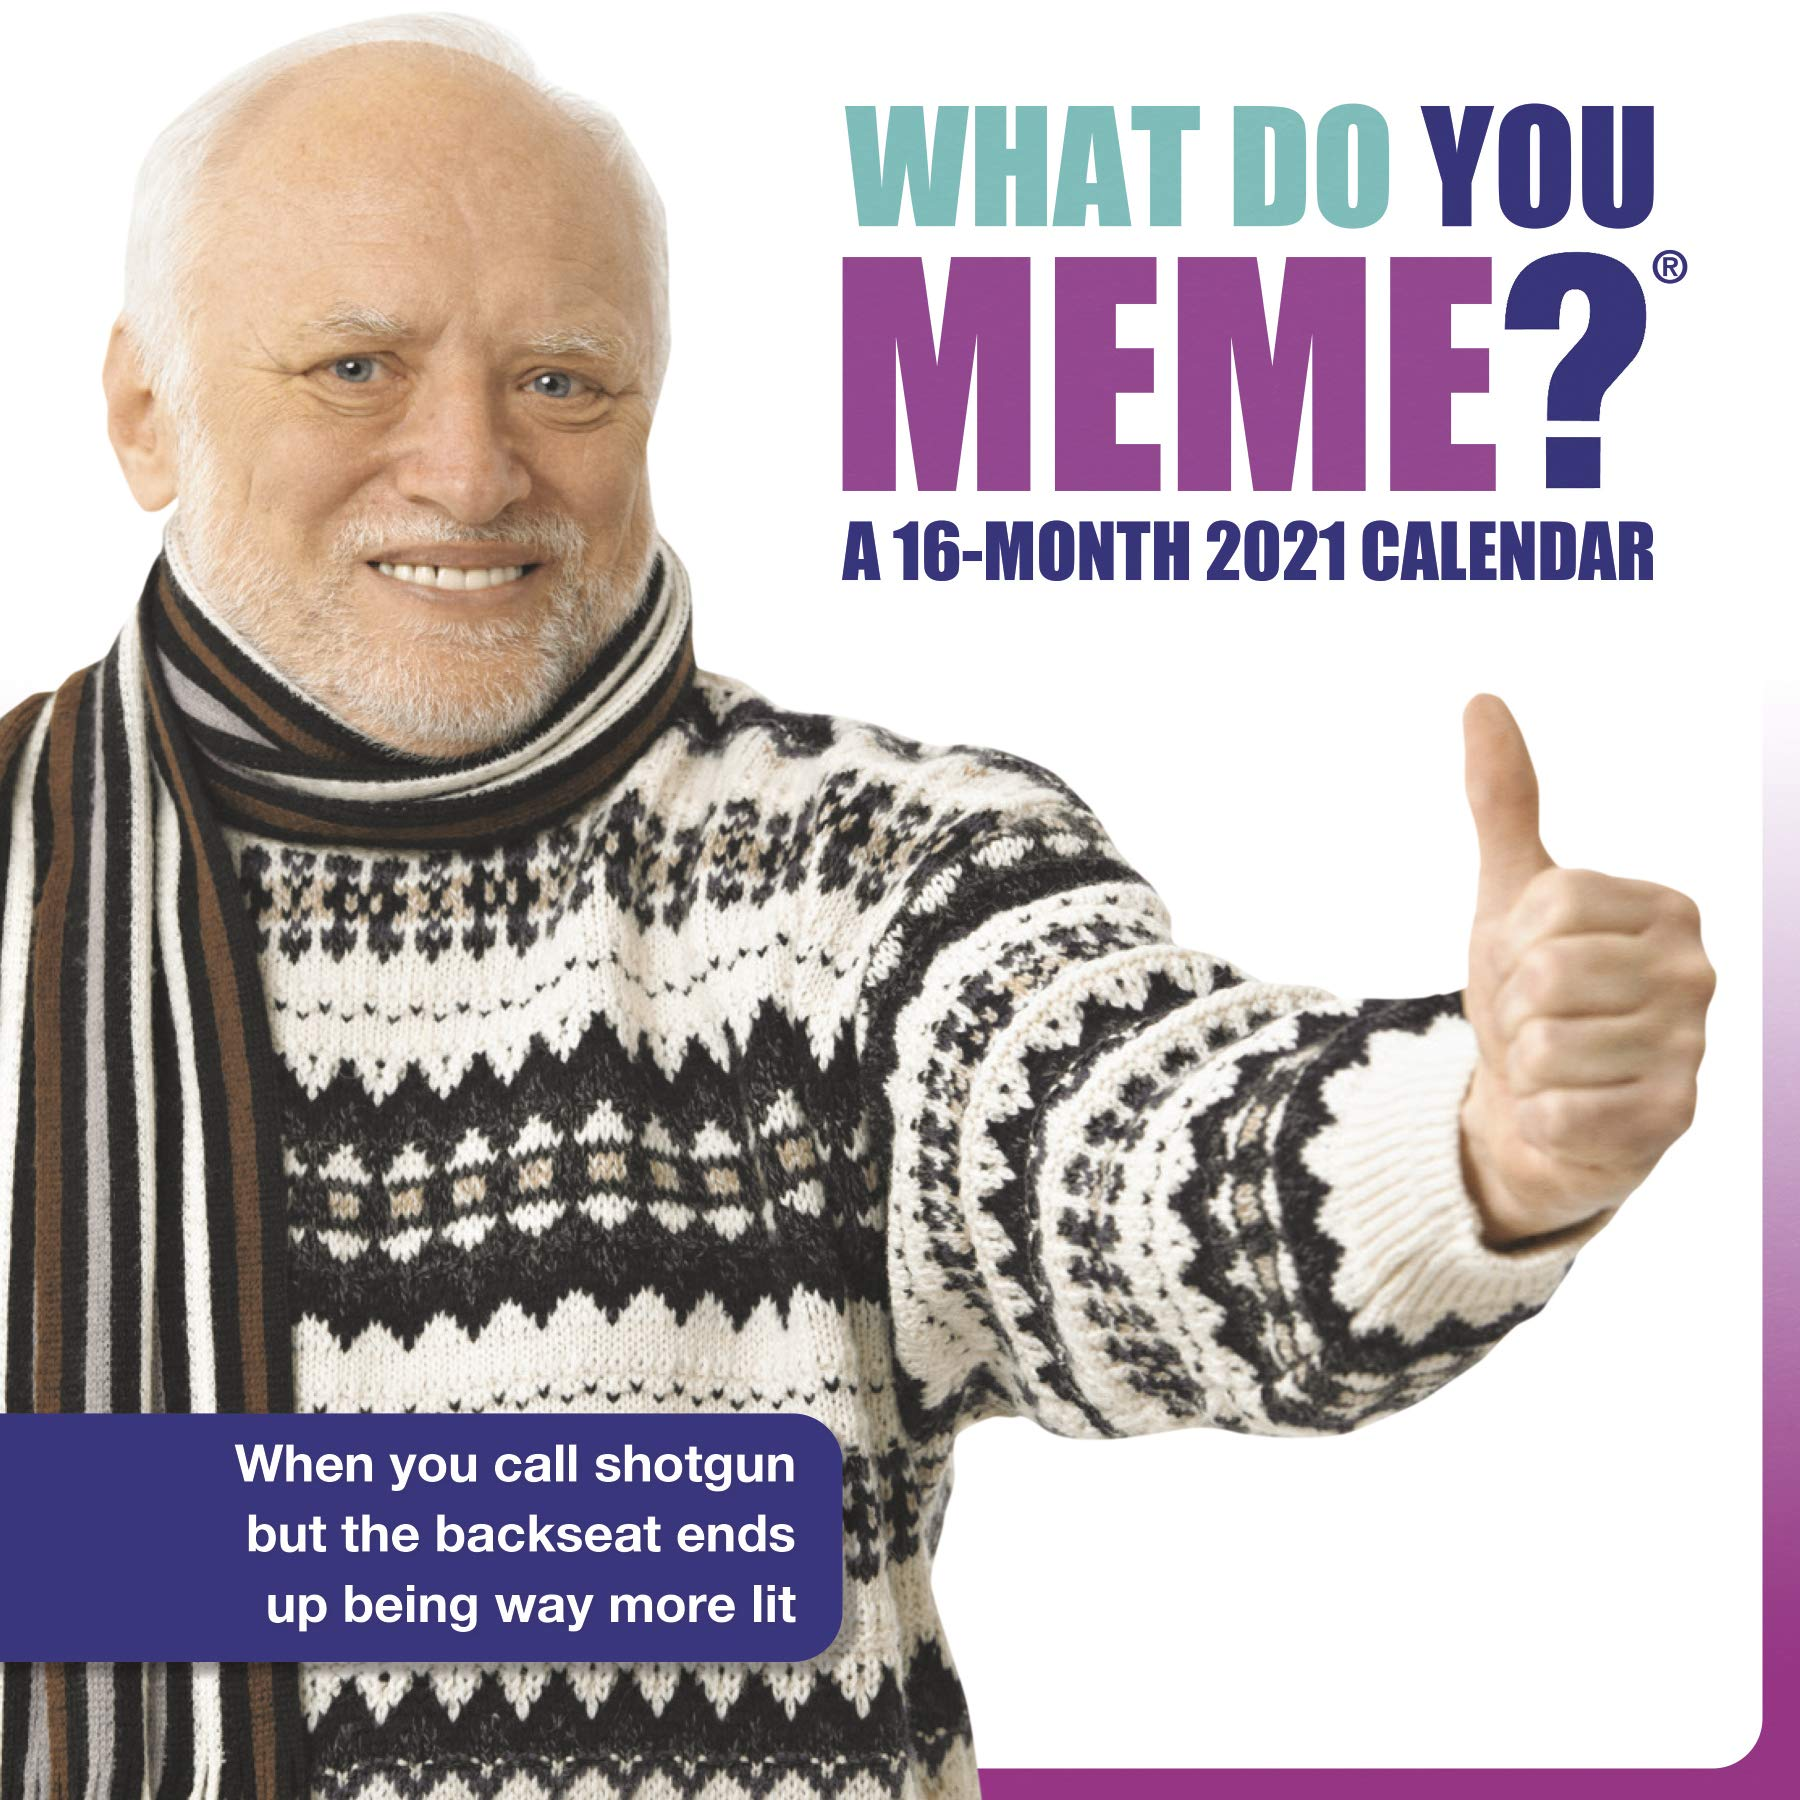 2021 Meme Calendar So Far 2021 What Do You Meme? Wall Calendar: Trends International